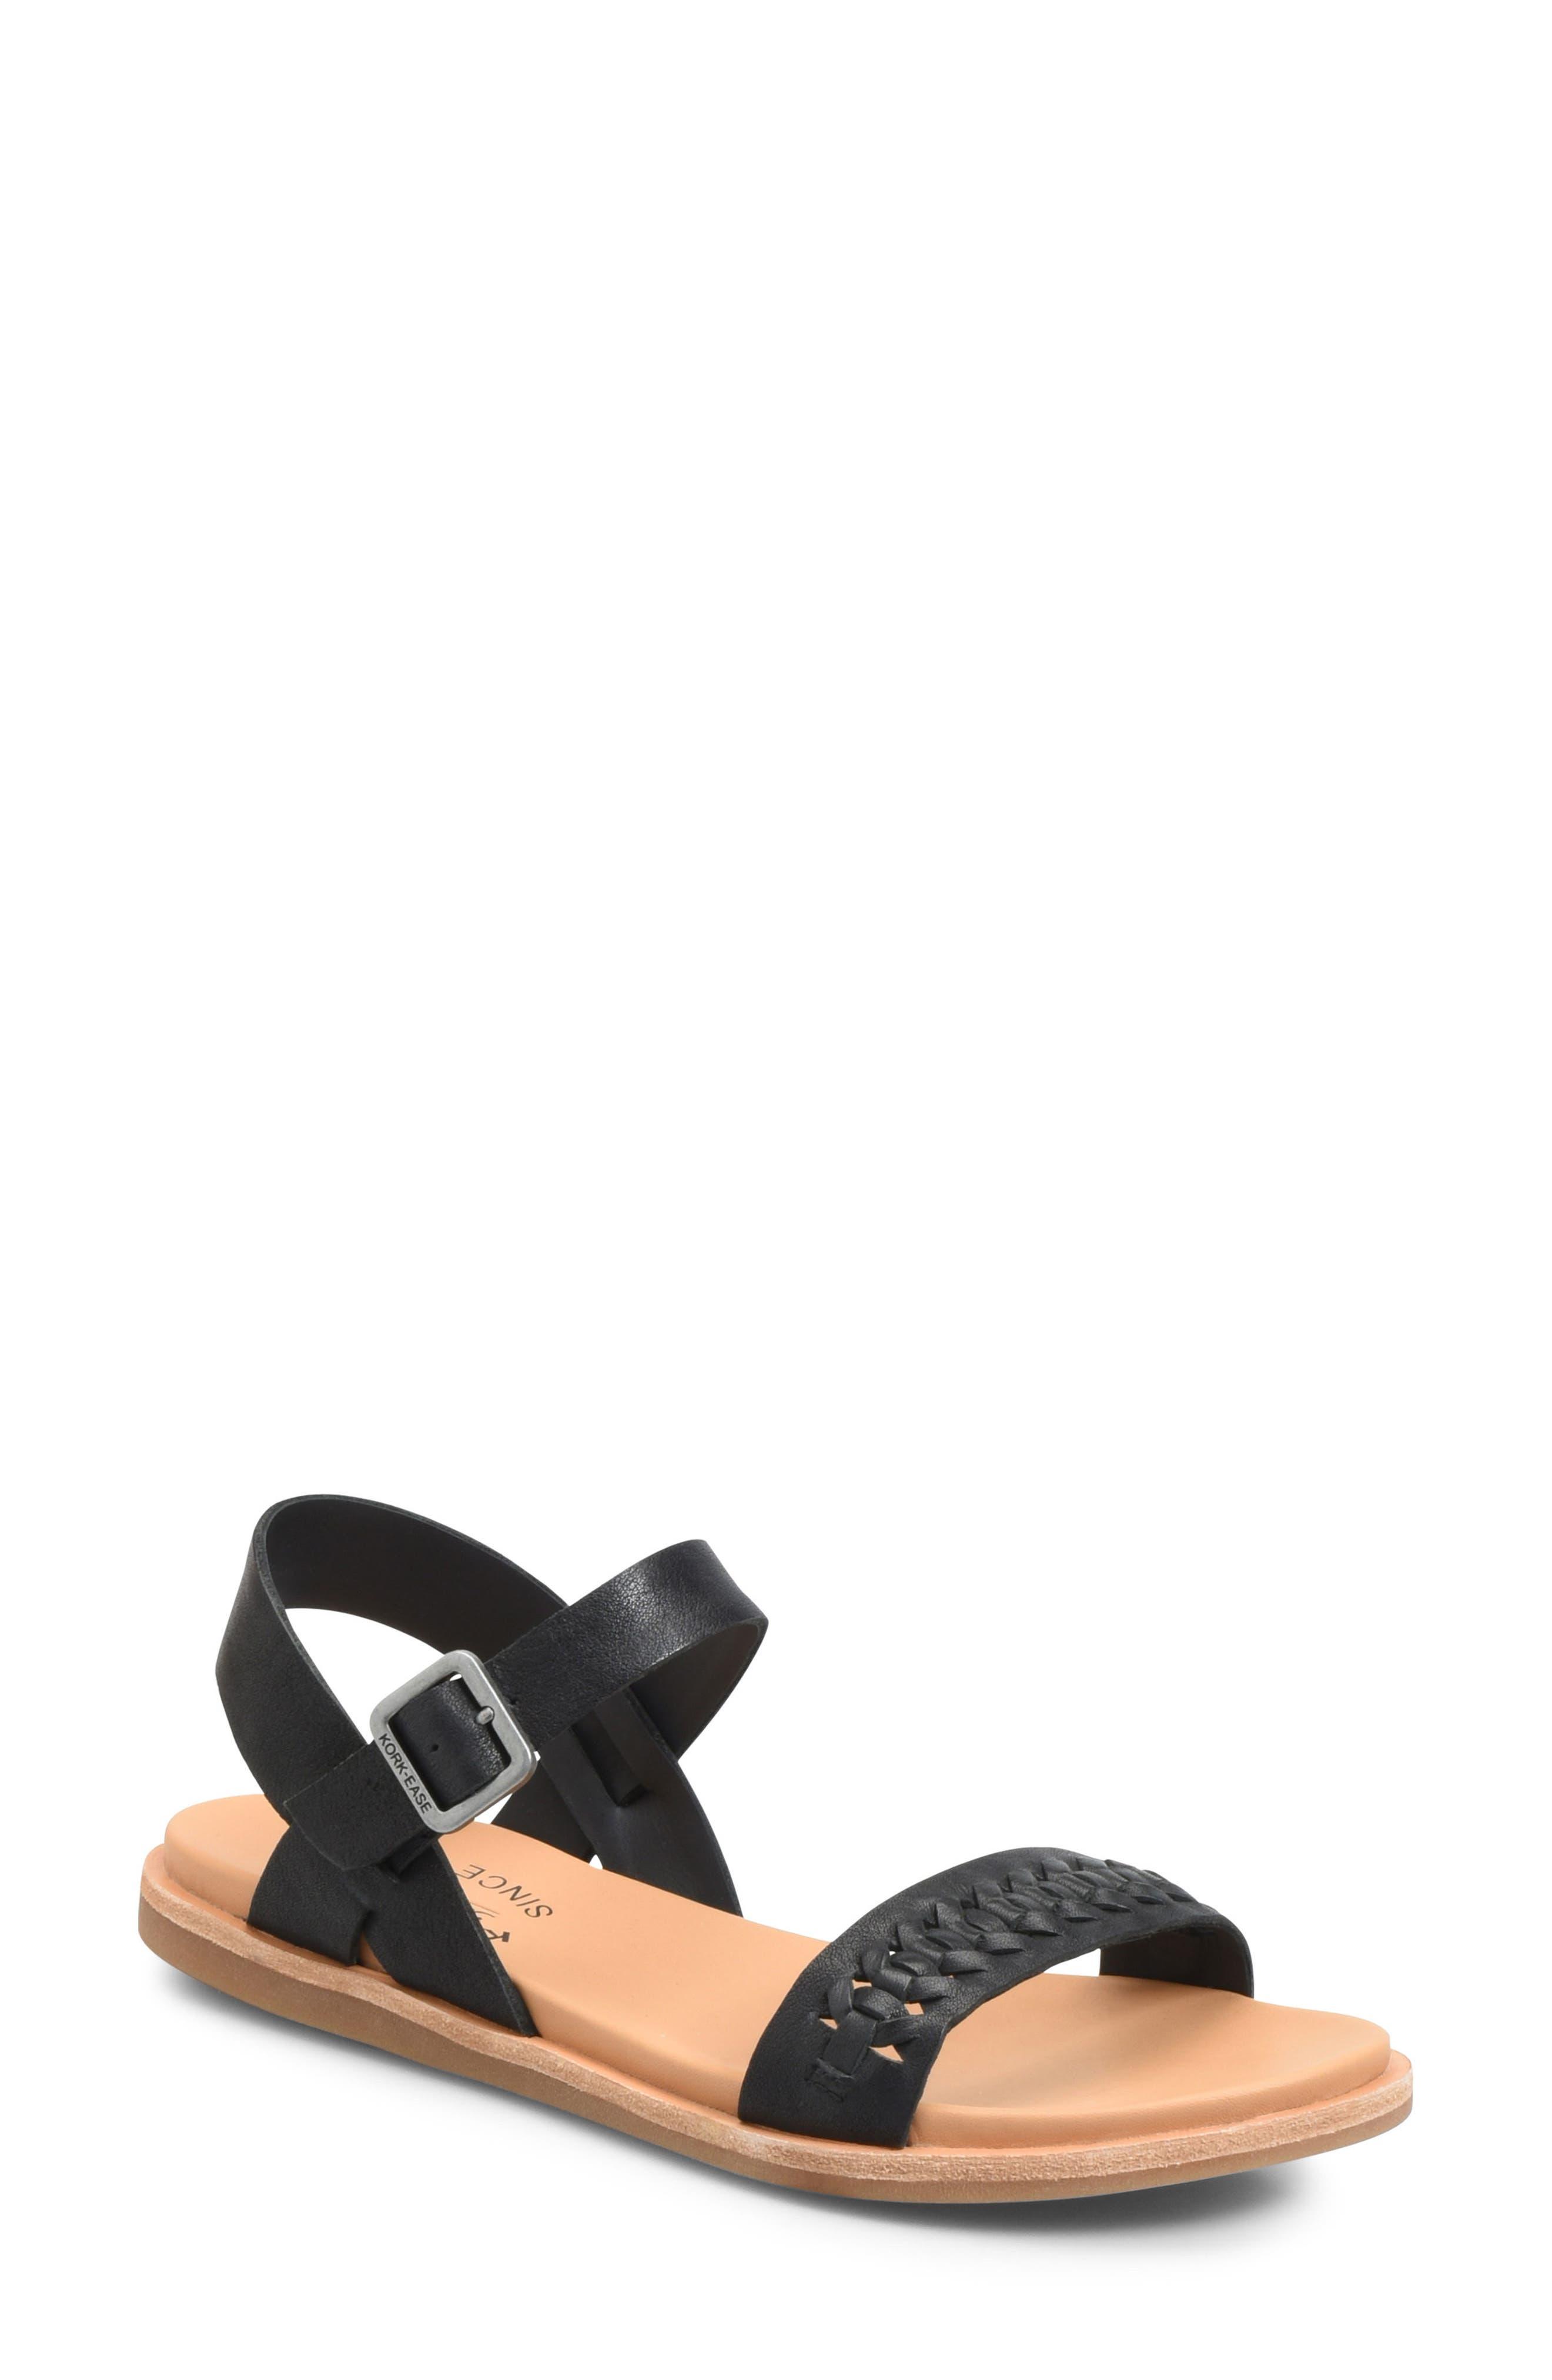 Yucca Braid Sandal,                             Main thumbnail 1, color,                             BLACK LEATHER